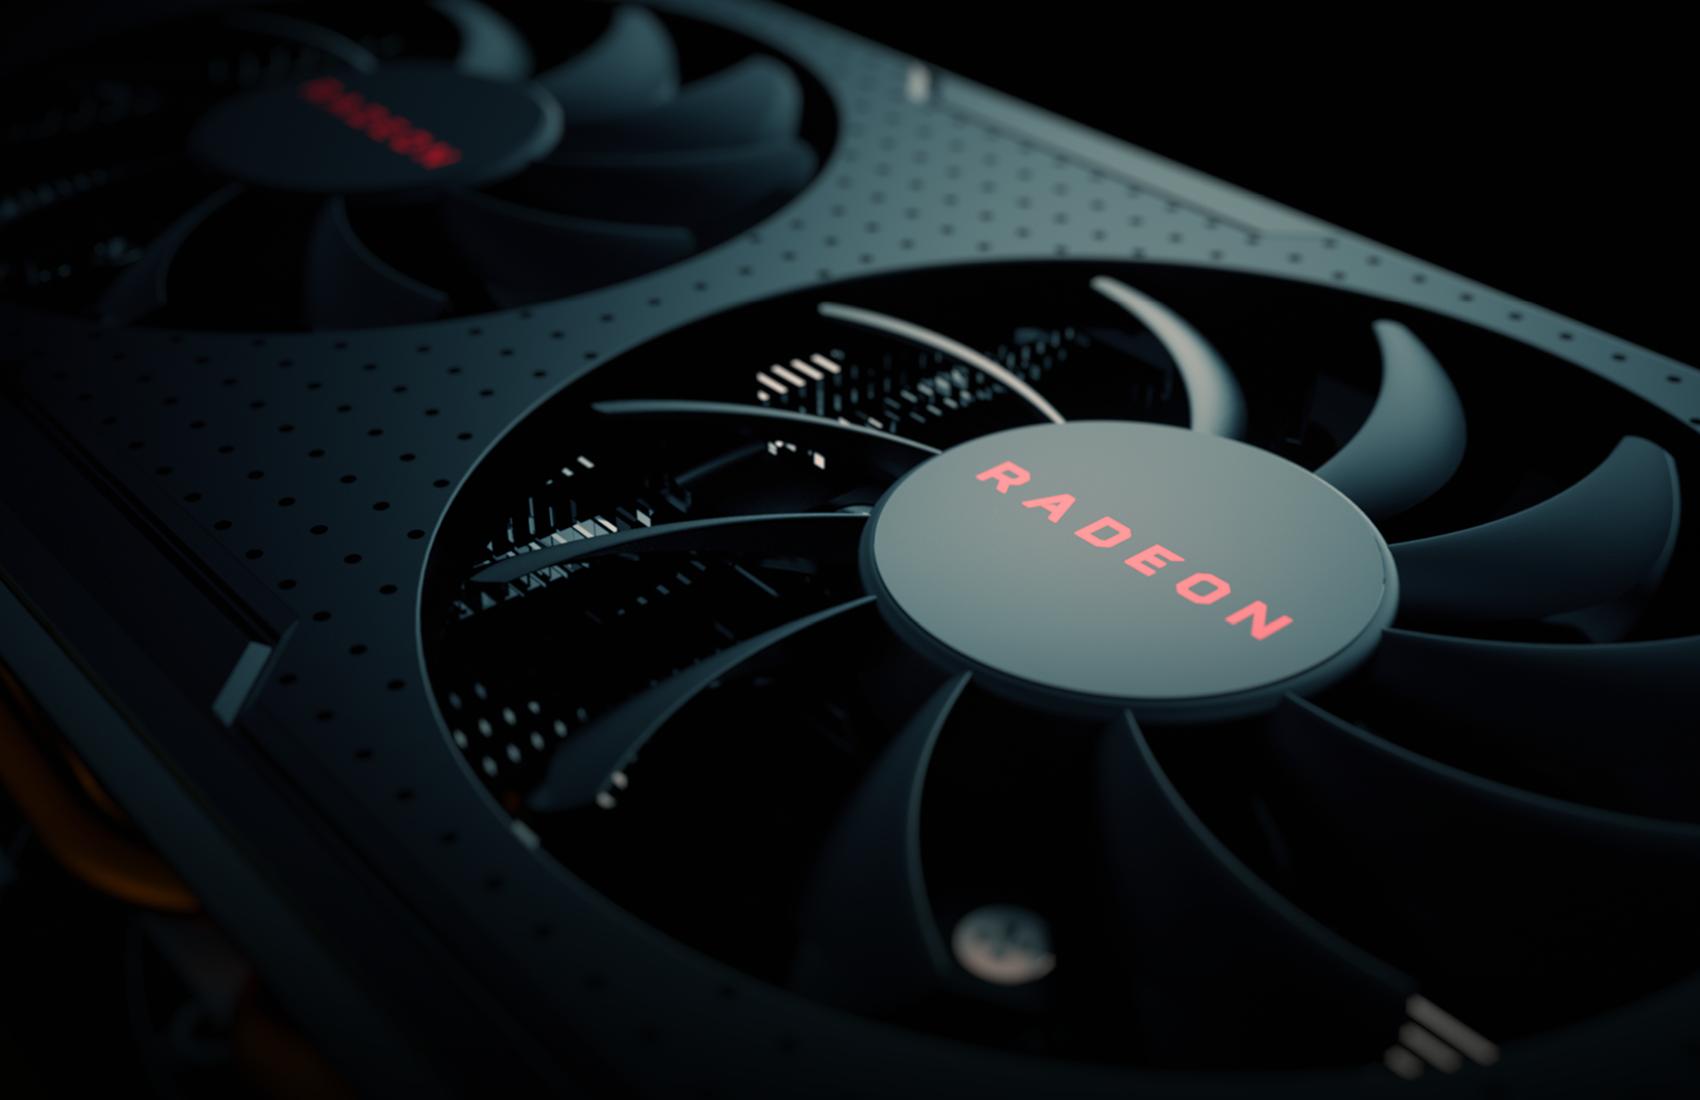 Radeon Rebranding & Launch Campaign